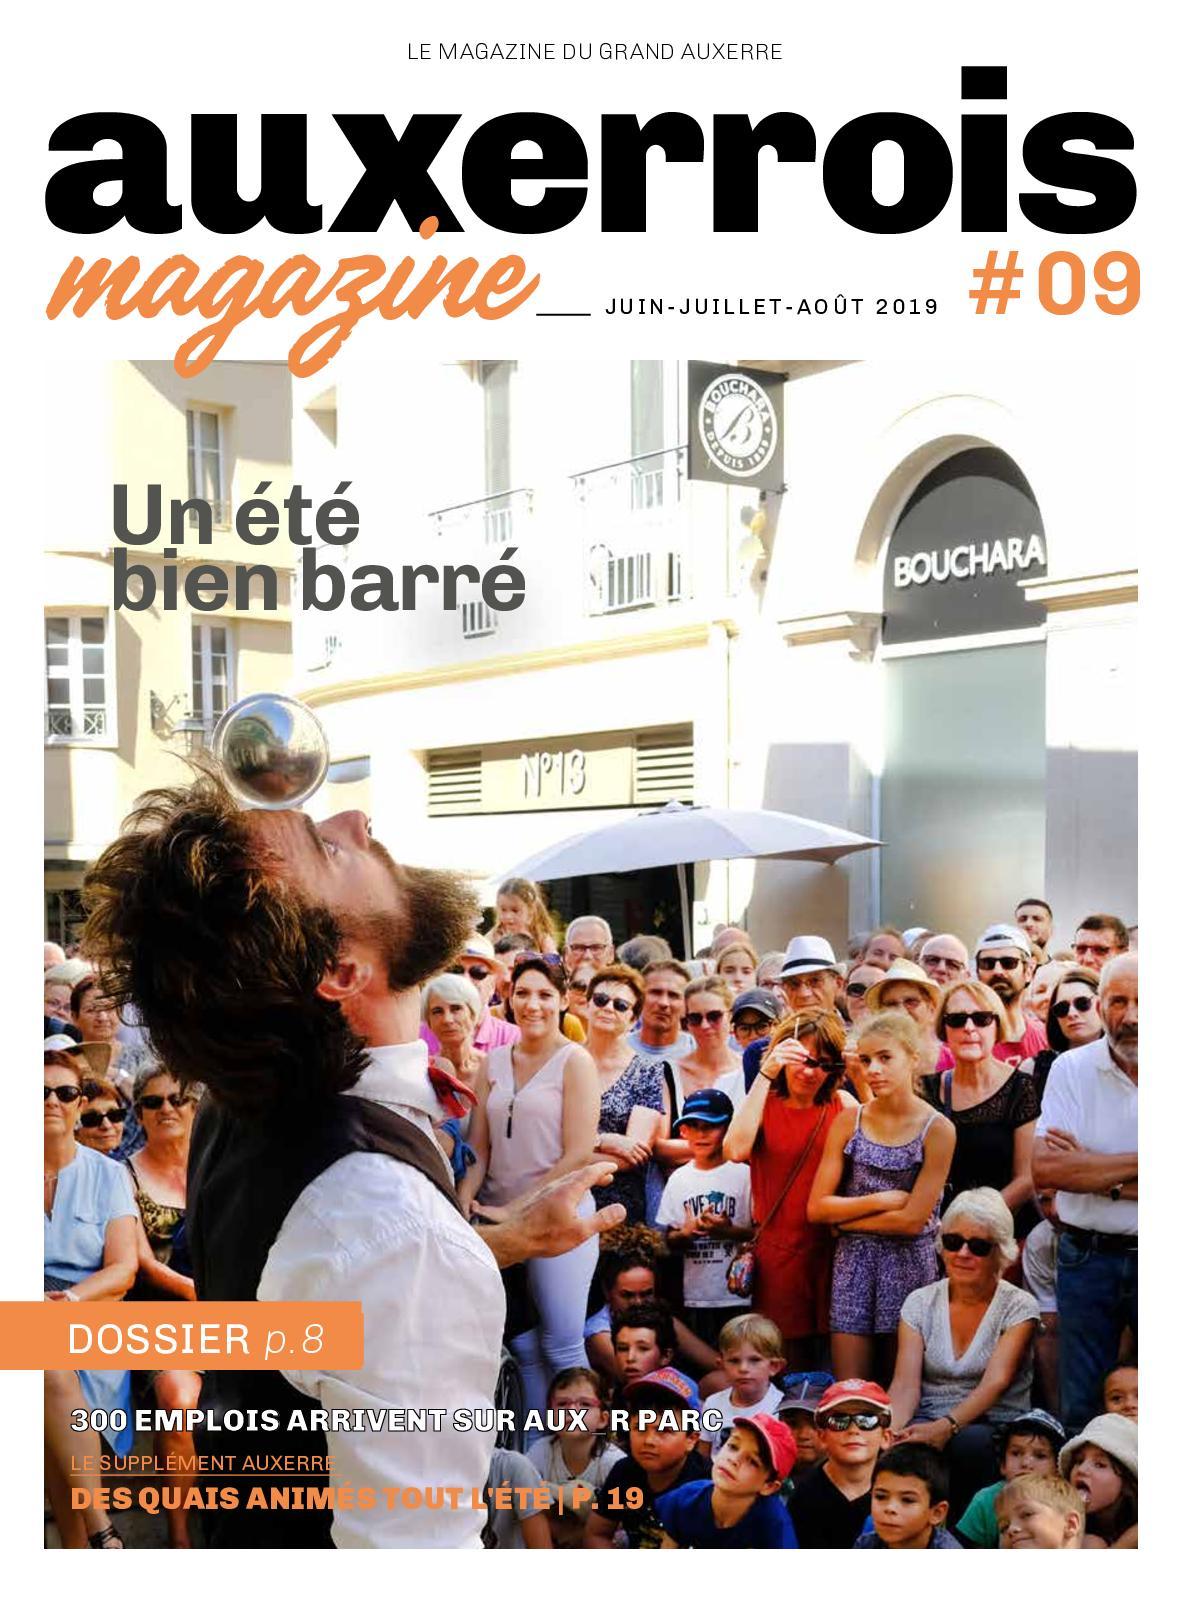 Aout 2019 Juillet Juin Mag Auxerrois Calaméo vmn80Nw